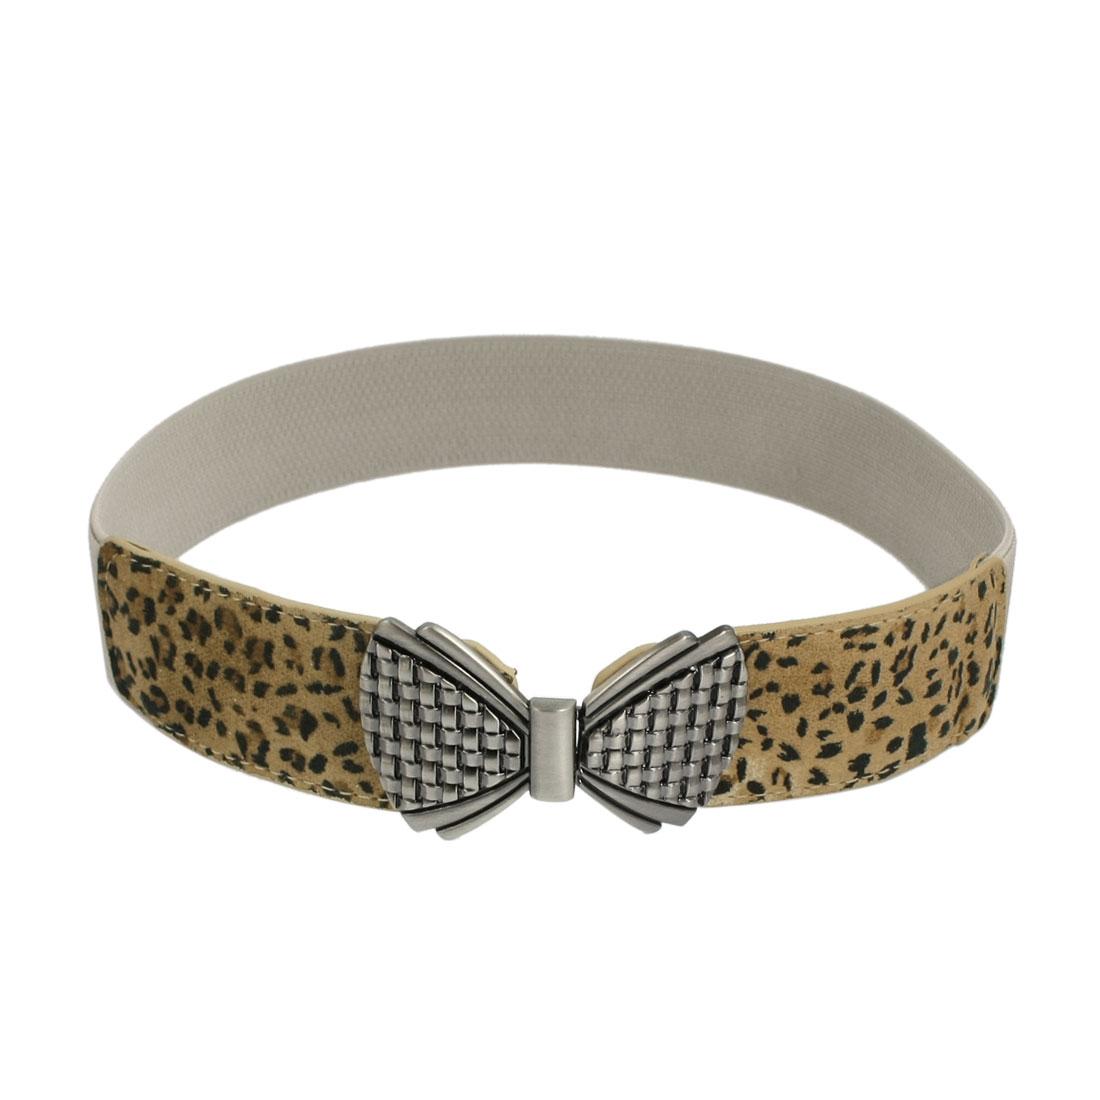 Lady Interlocking Closure Leopard Pattern Faux Leather Stretchy Waist Belt Khaki